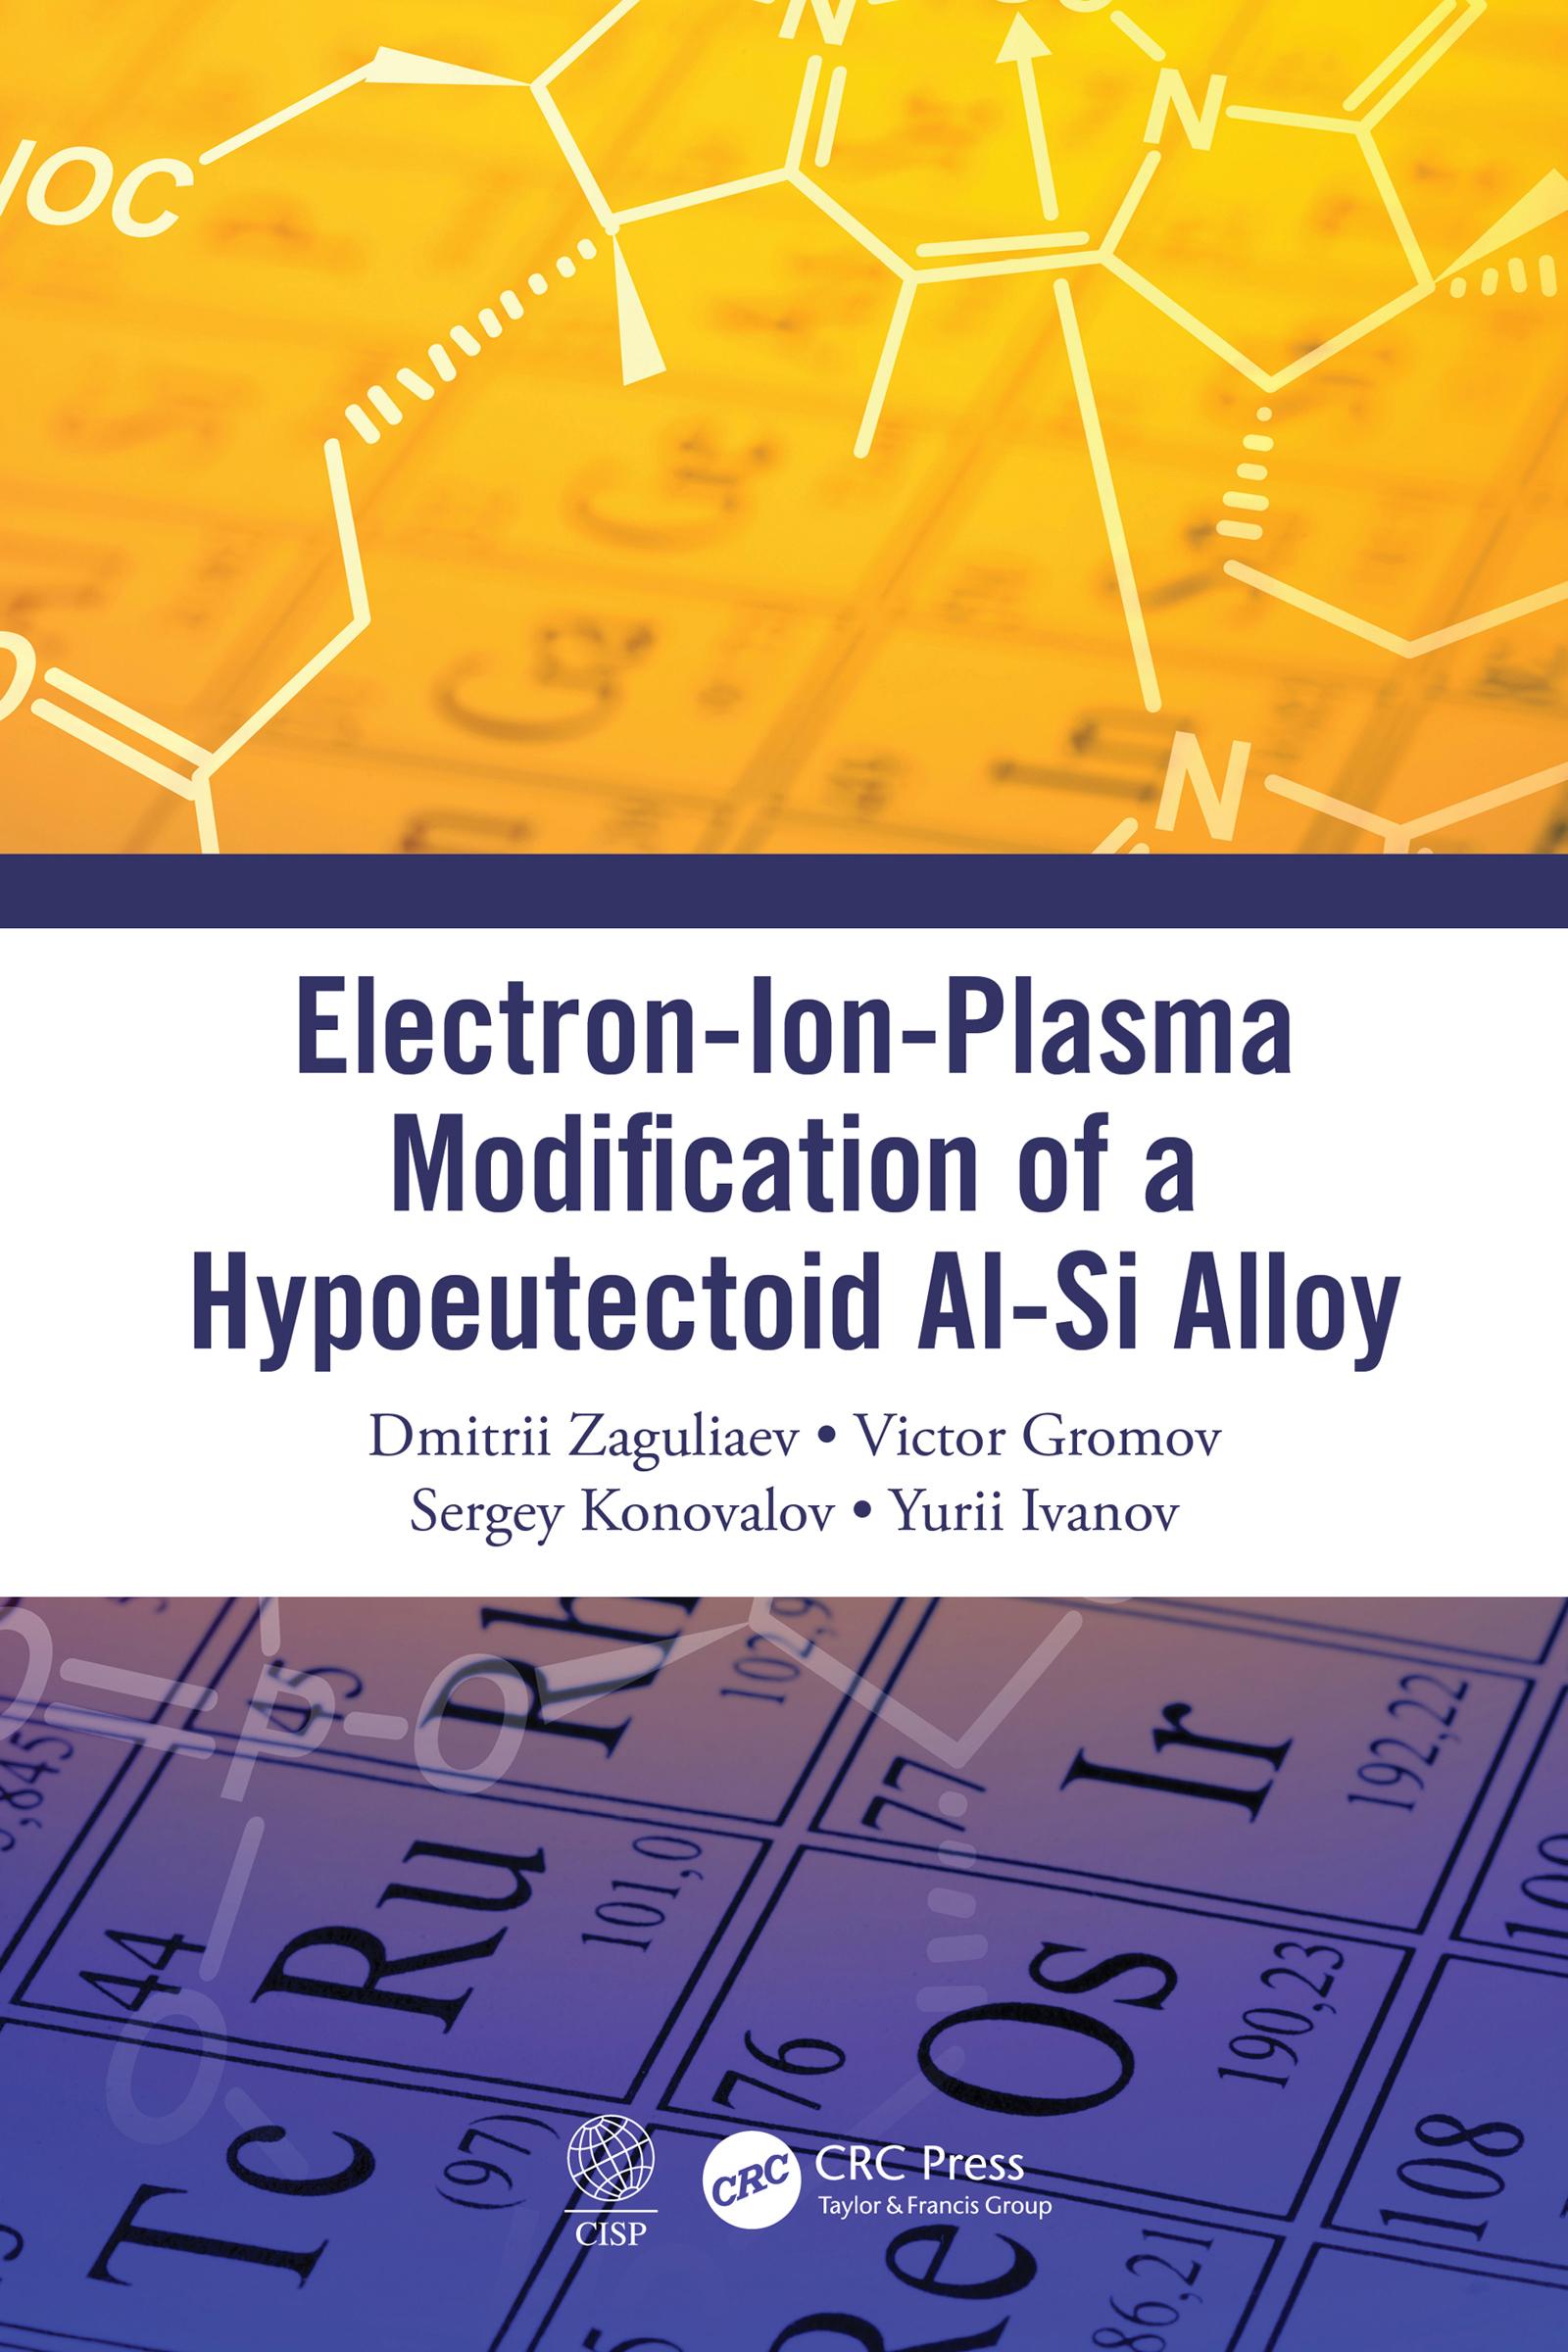 Electron-Ion-Plasma Modification of a Hypoeutectoid Al-Si Alloy